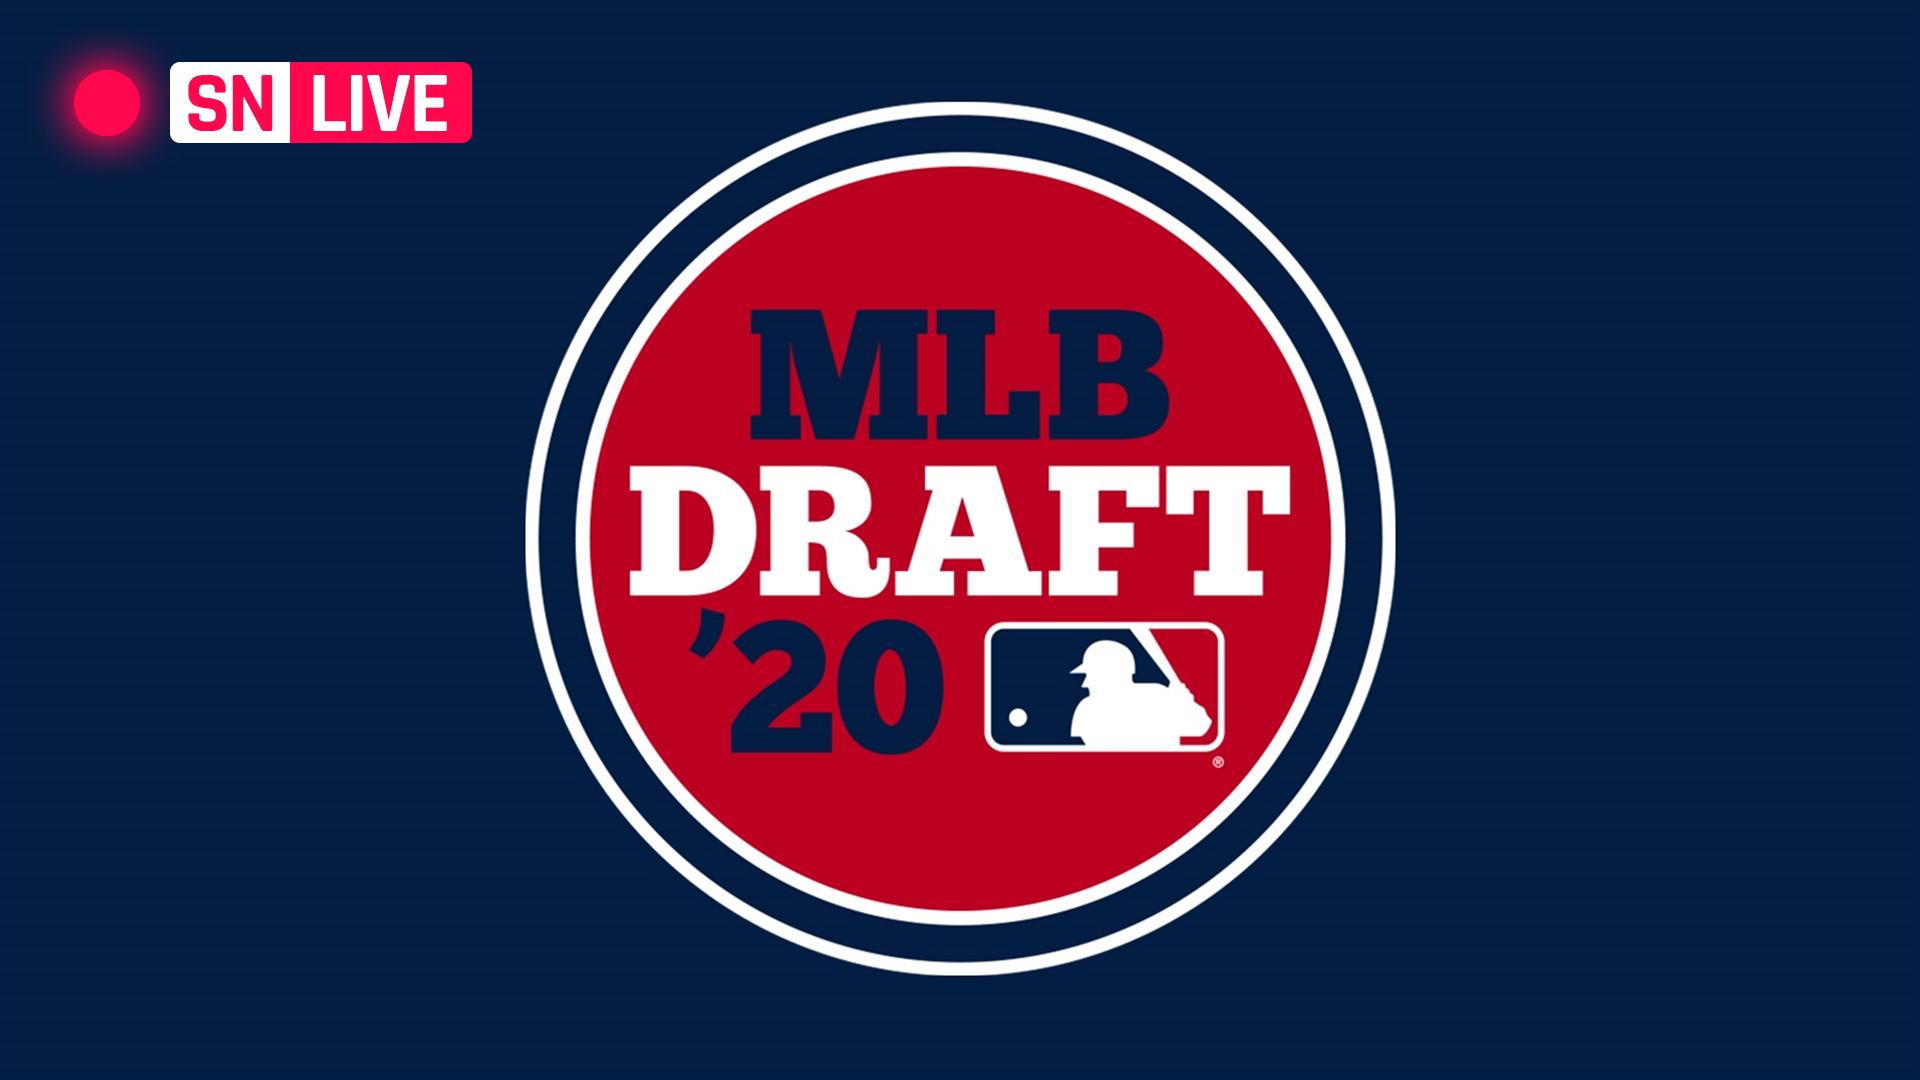 MLB Draft tracker 2020: Live results, complete picks list for Rounds 1-5 in baseball draft